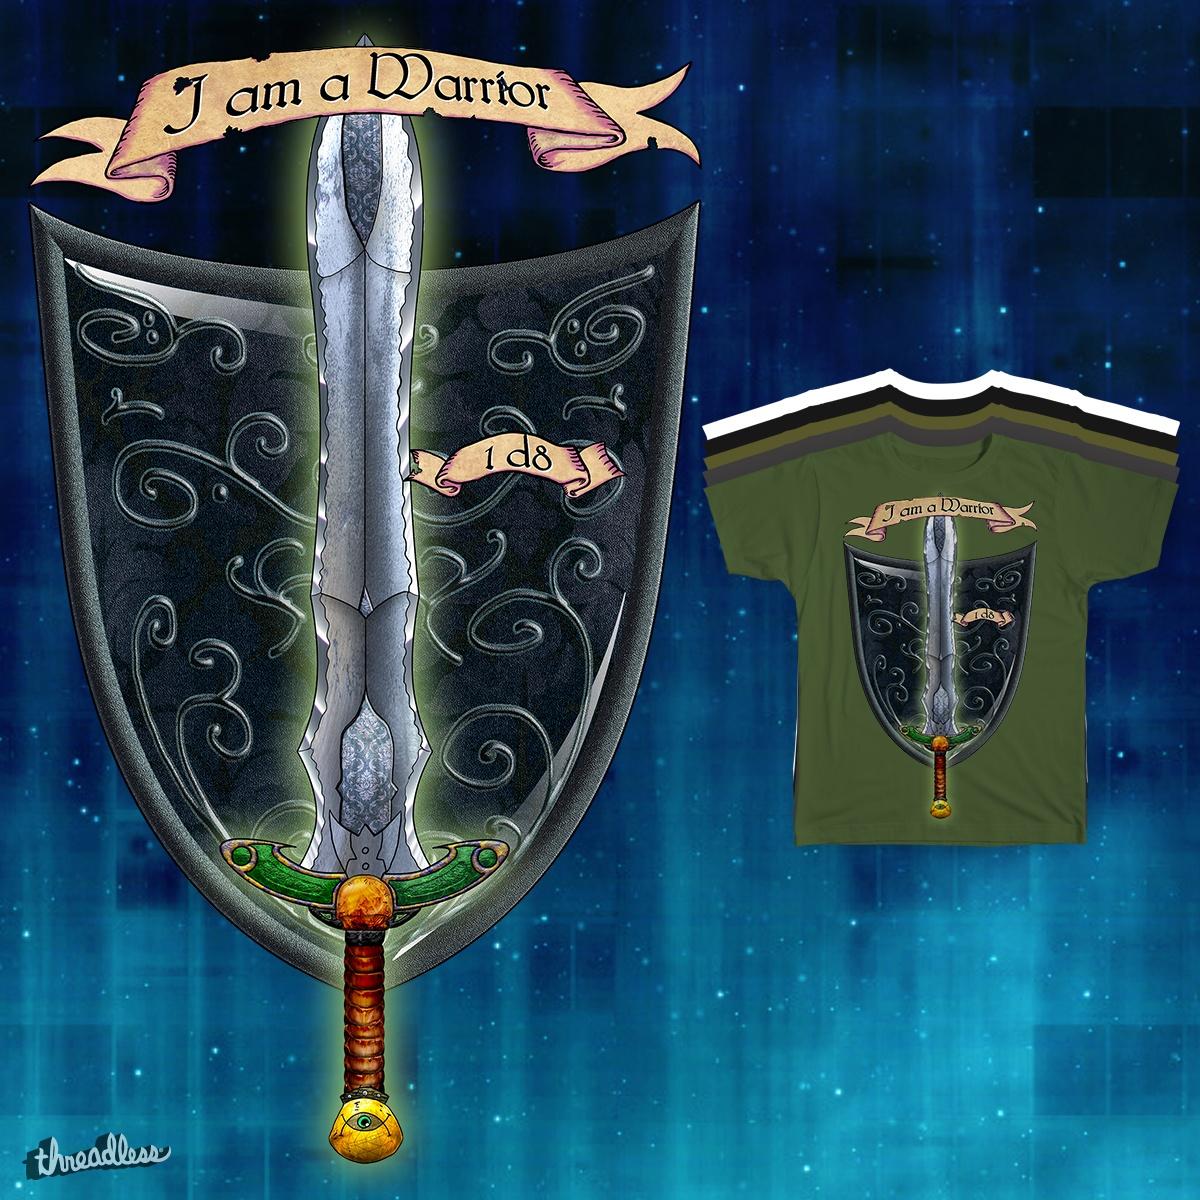 I am a Warrior by Narrd on Threadless